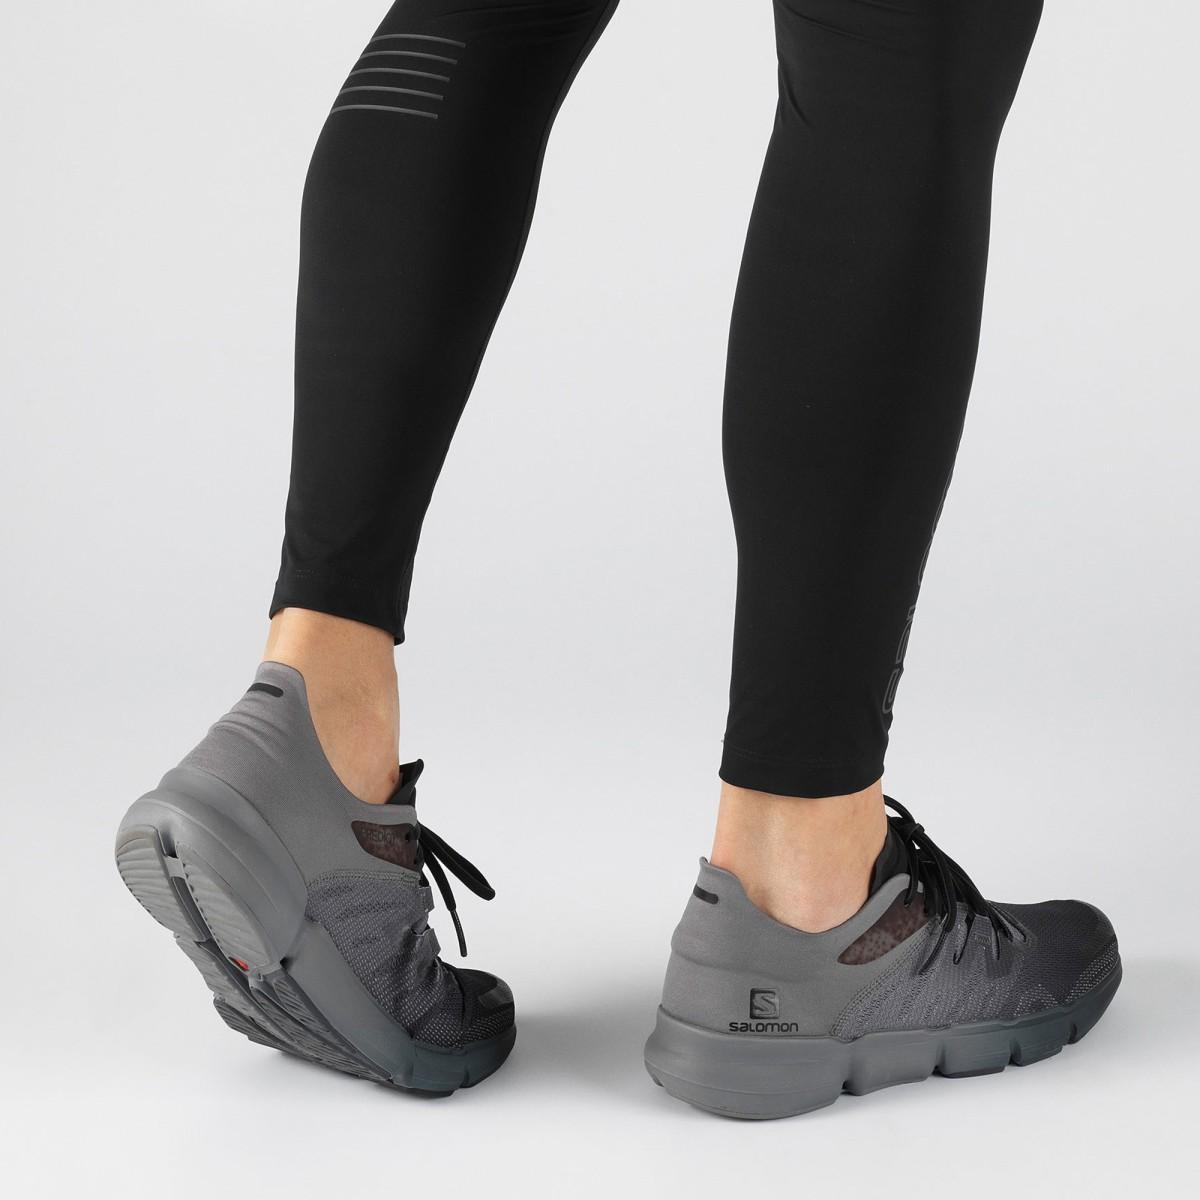 SALOMON running shoes PREDICT RA grey